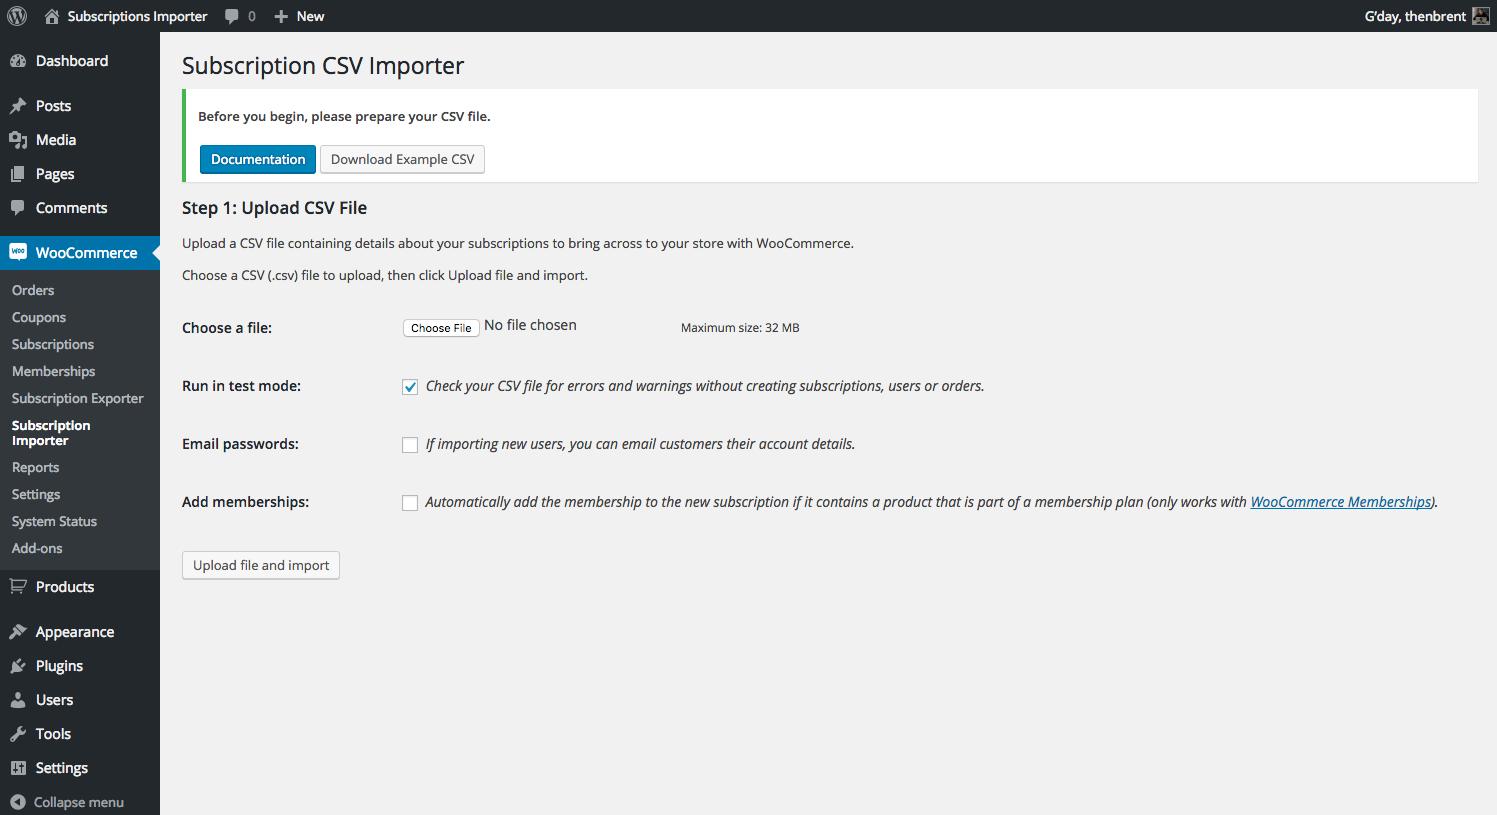 GitHub - Prospress/woocommerce-subscriptions-importer